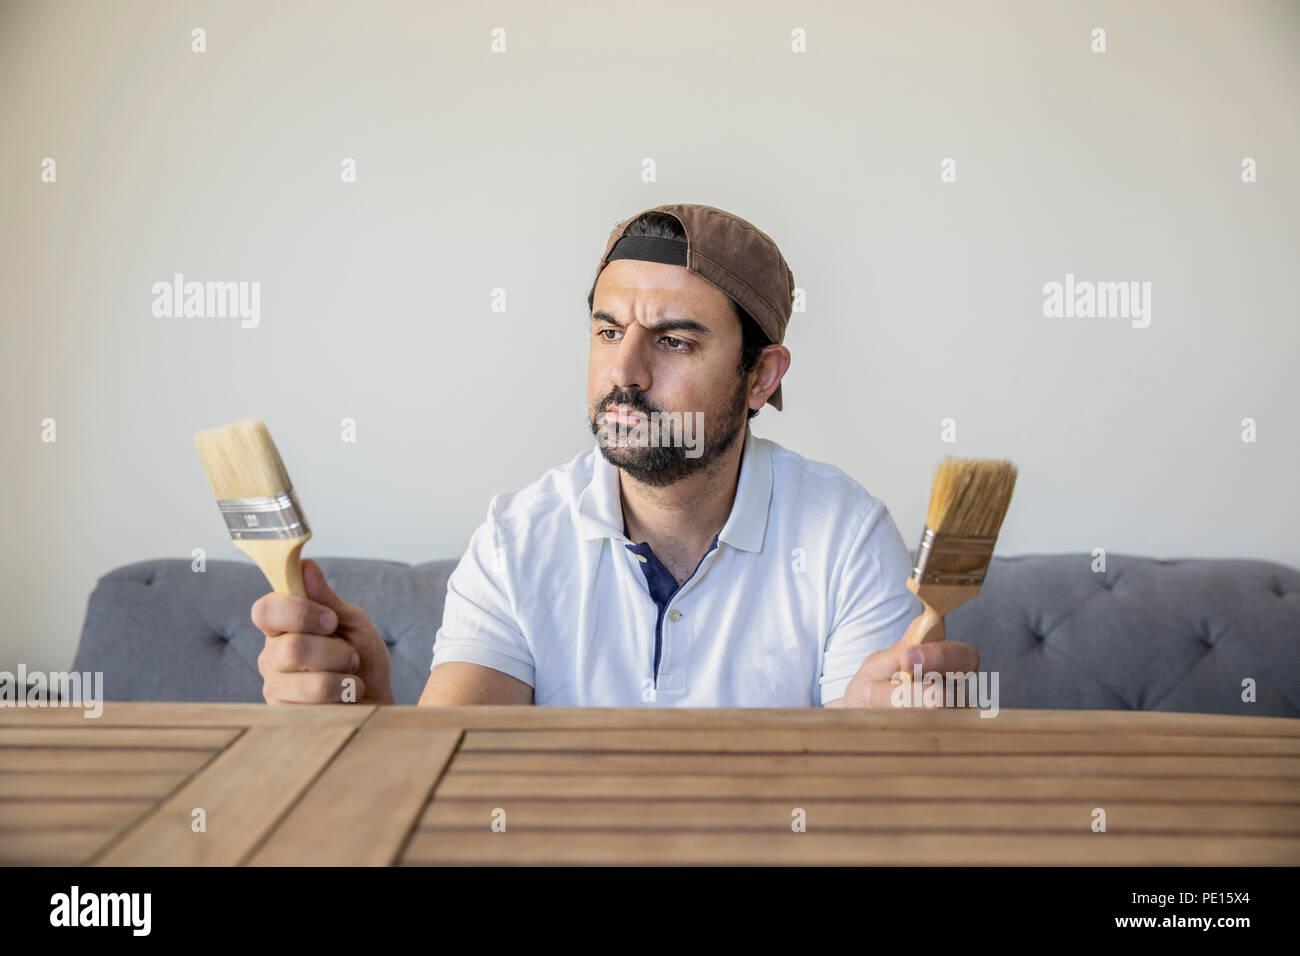 arab man choosing a pint brush to renovate a teak wood table - Stock Image